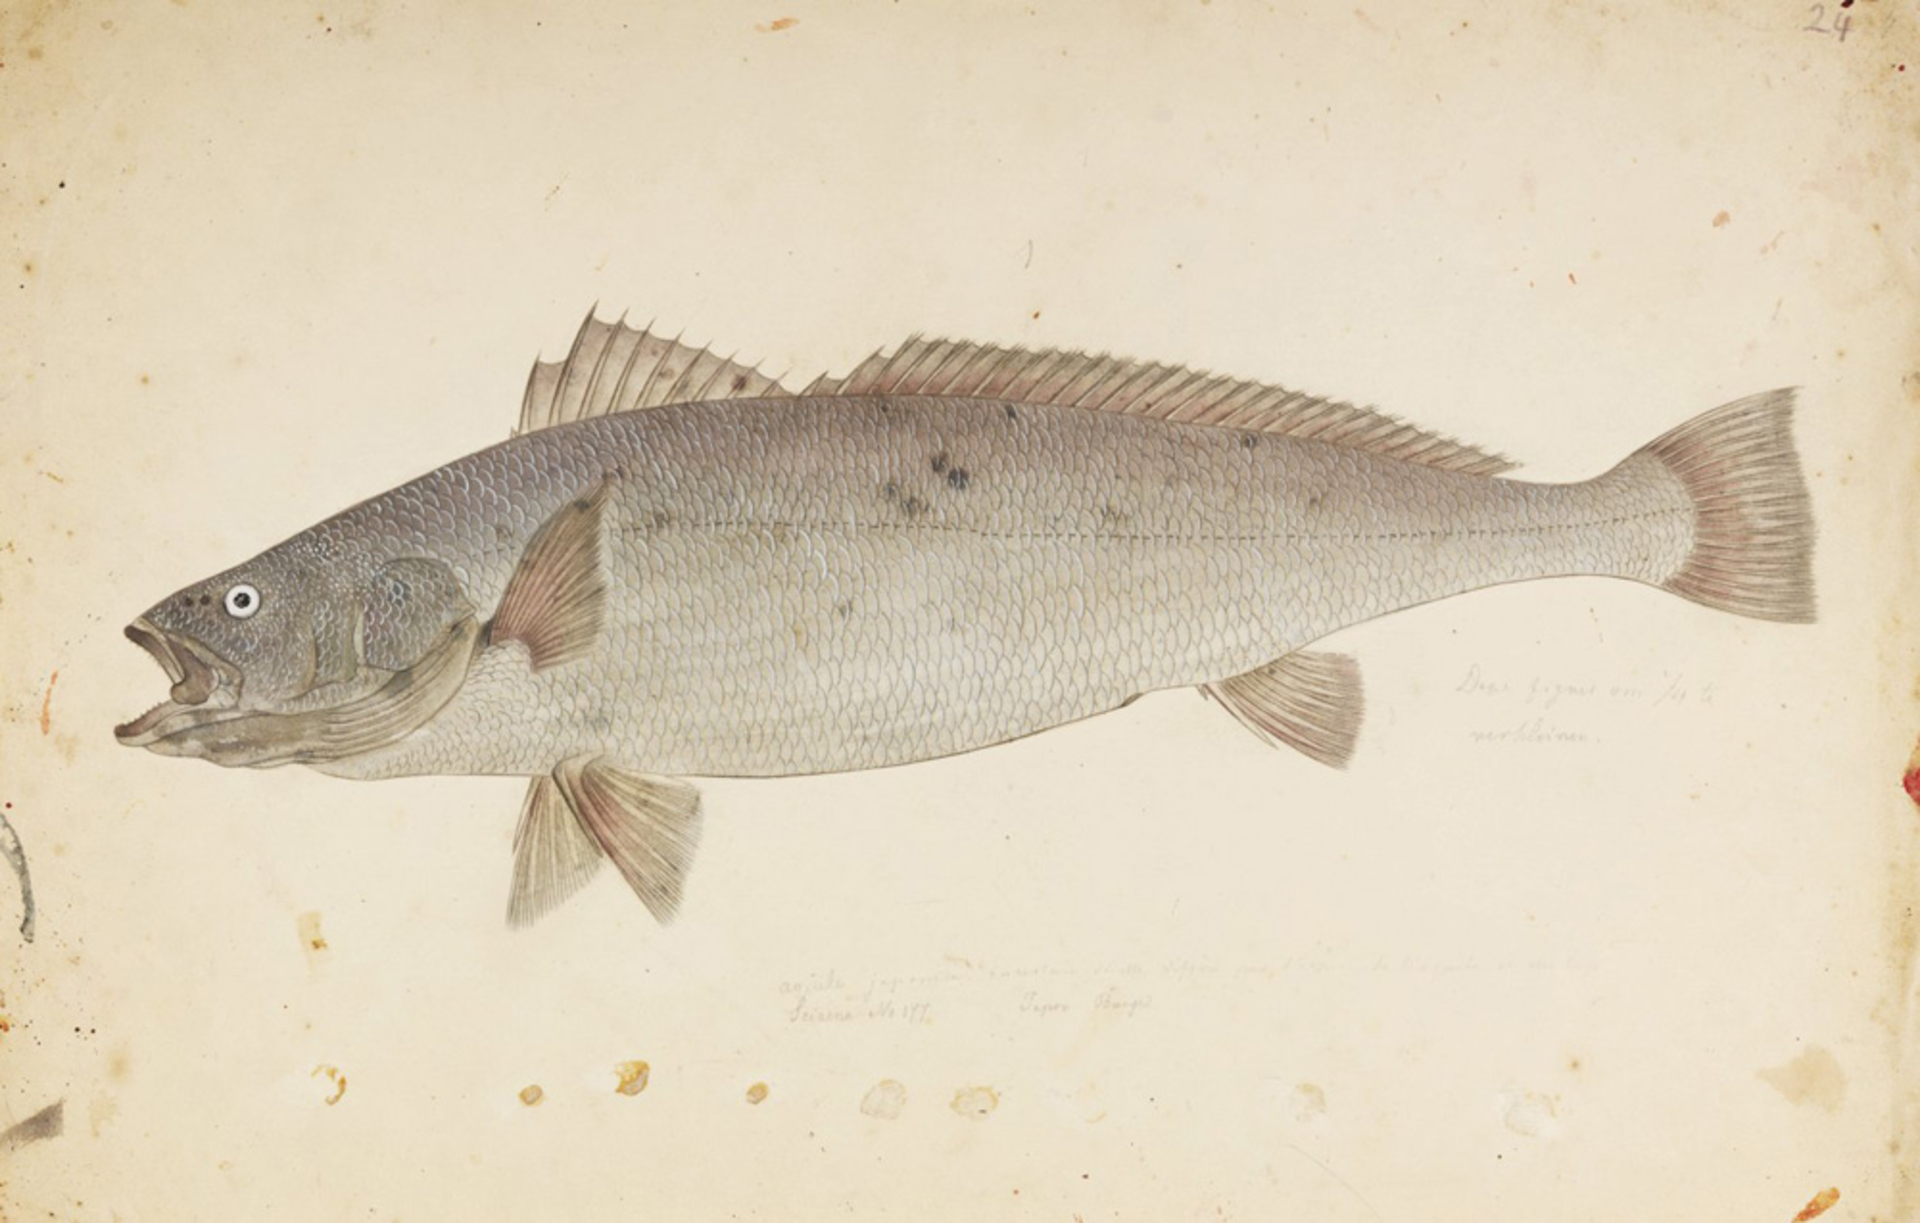 RMNH.ART.321 | Argyrosomus japonicus